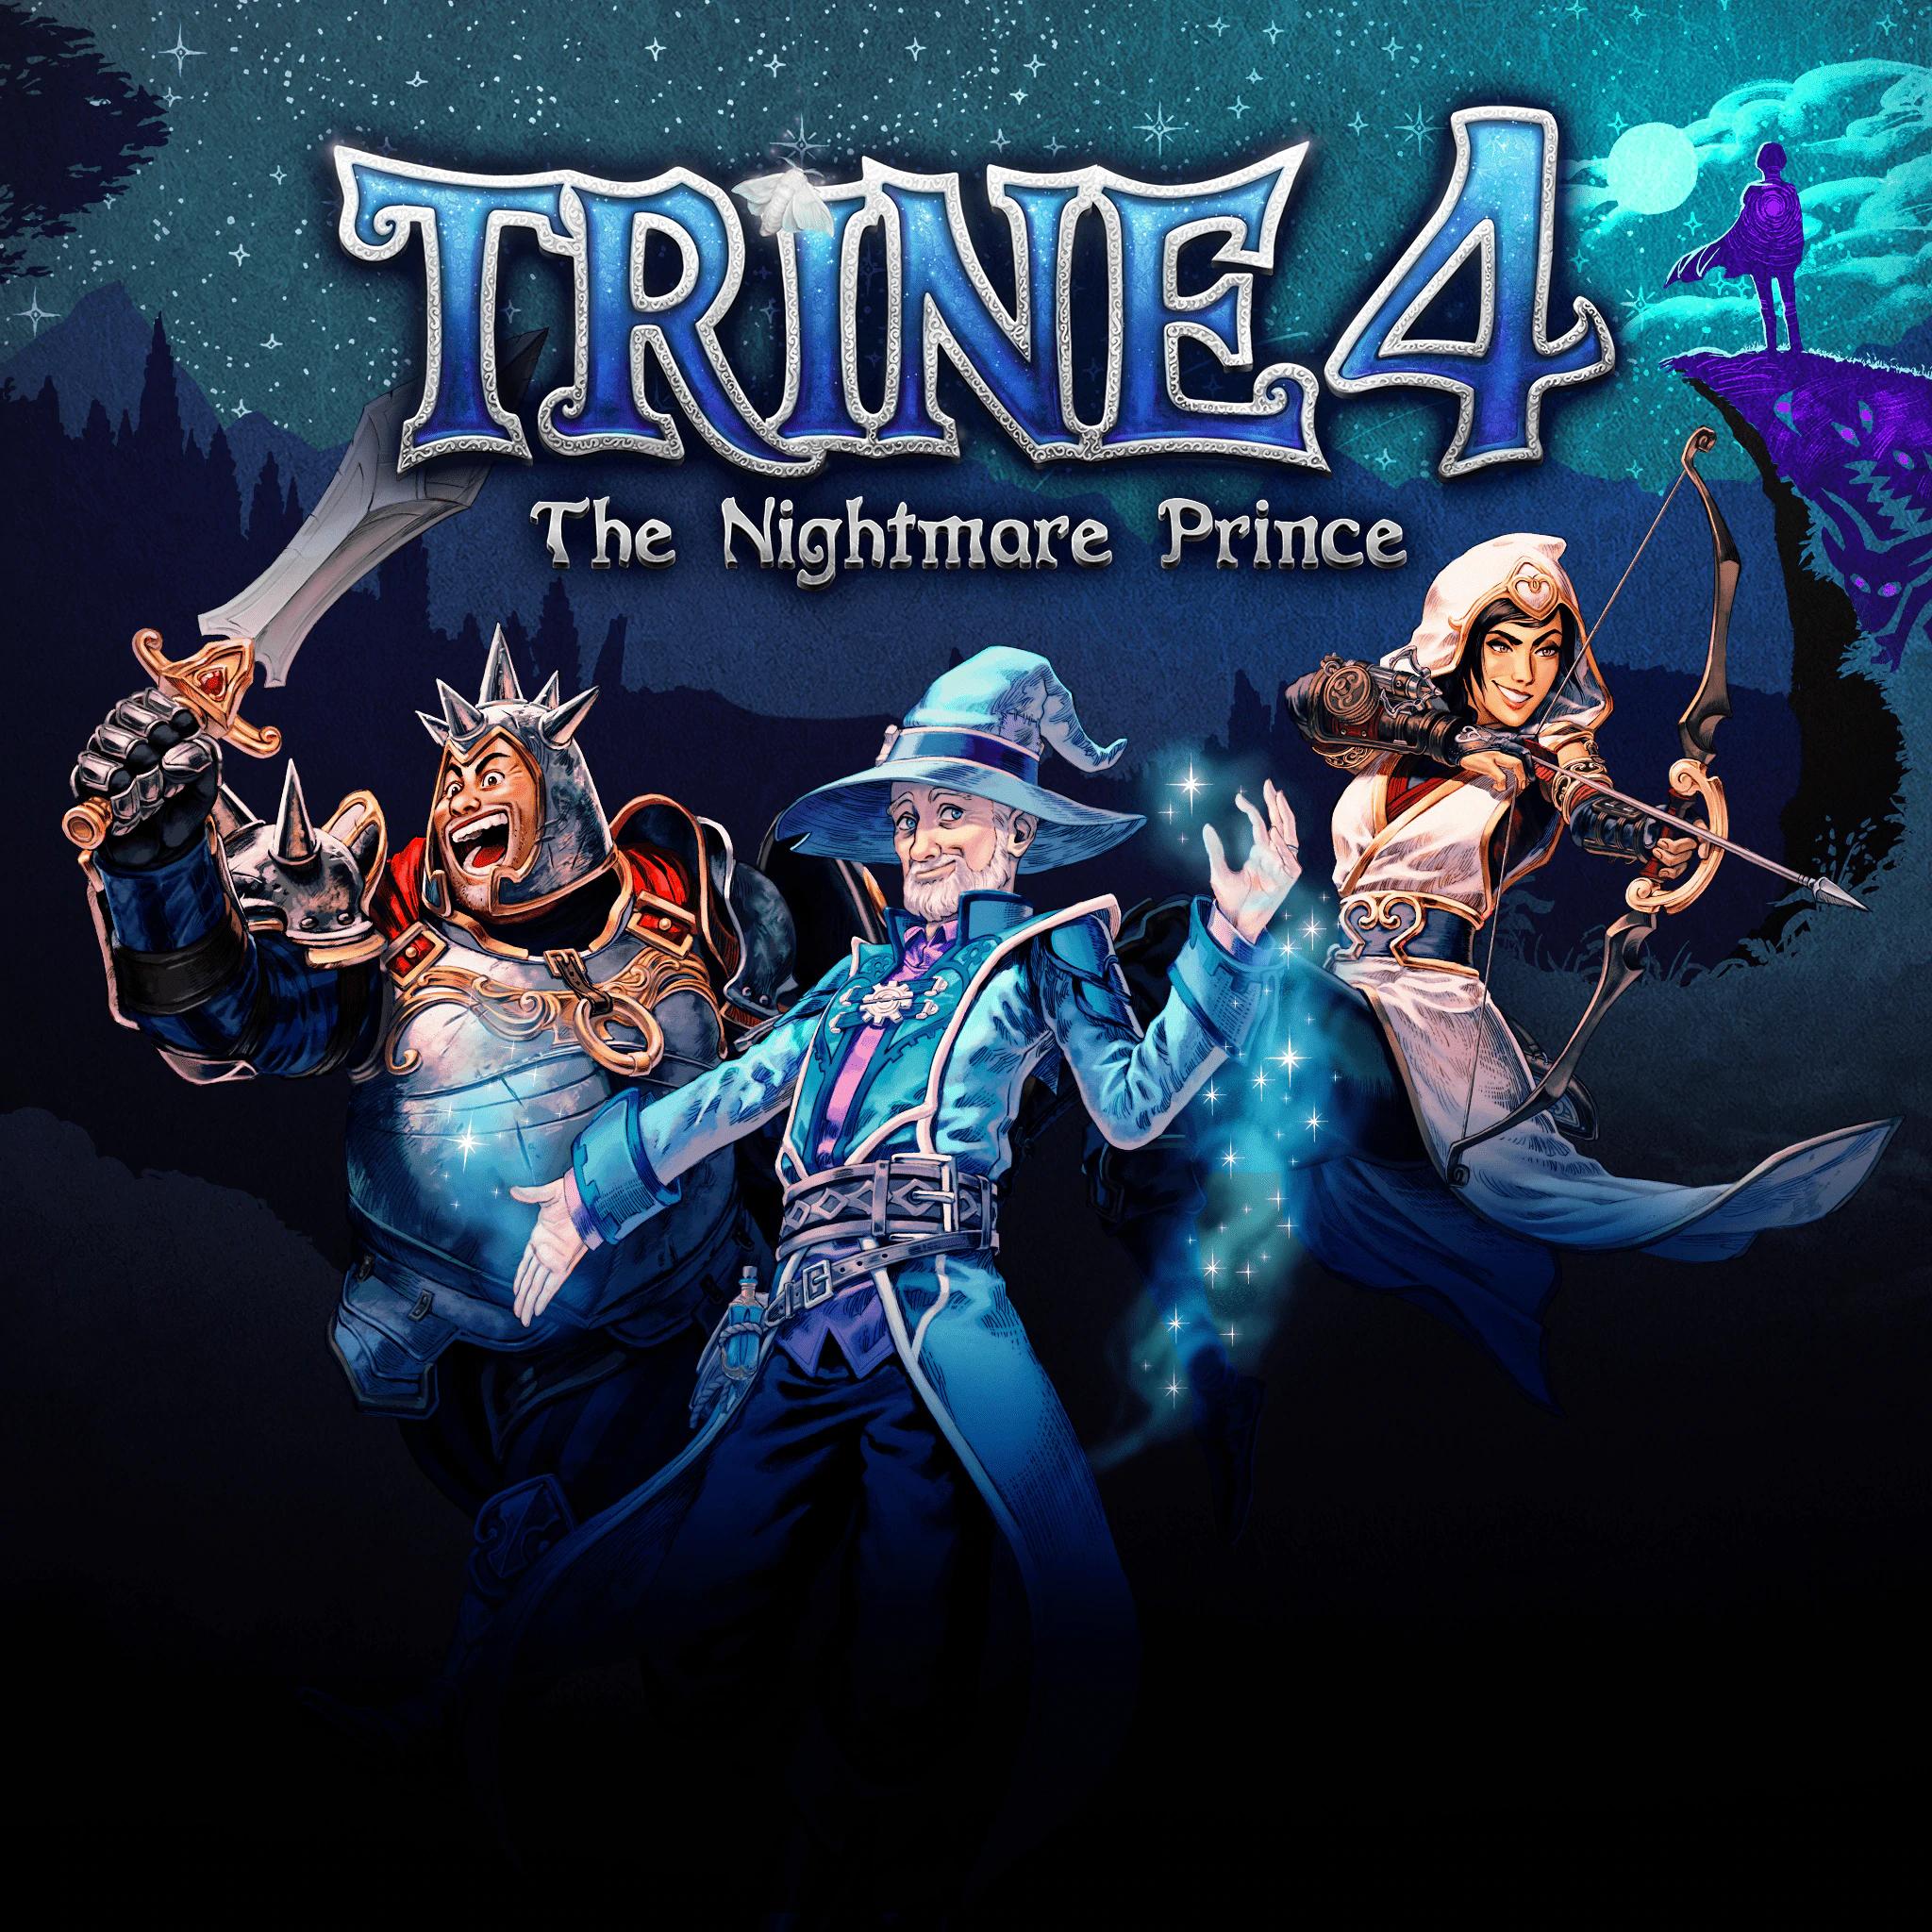 [Stadia Pro] Trine 4: The Nightmare Prince, Hotline Miami 2: Wrong Number, Floor Kids offerts (Dématérialisés)